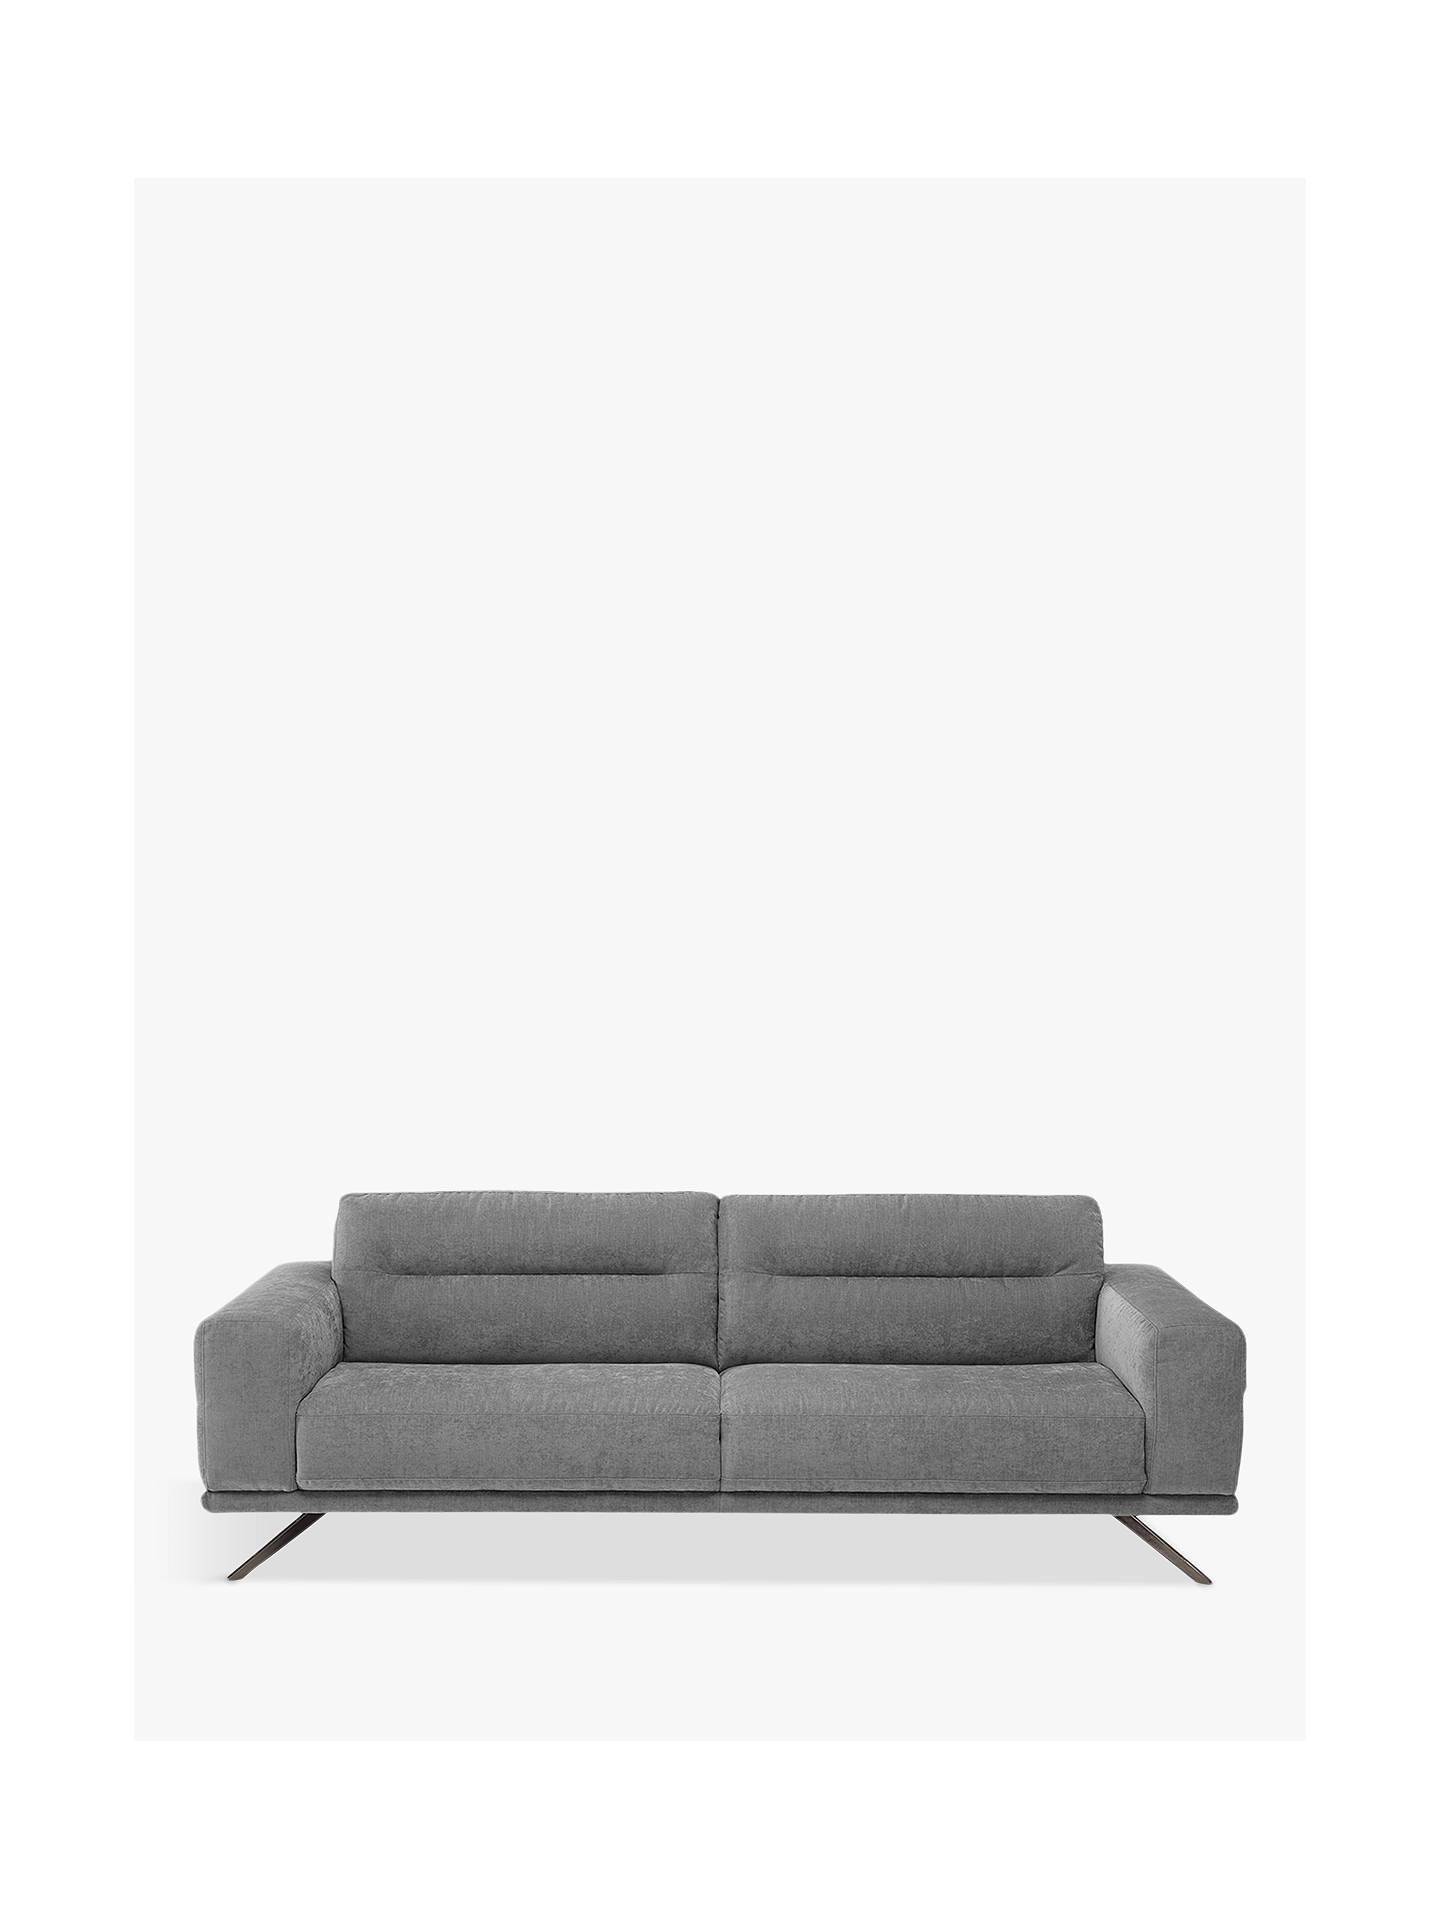 Natuzzi Timido 009 Large 3 Seater Fabric Sofa Chrome Leg Mistral Agave Online At